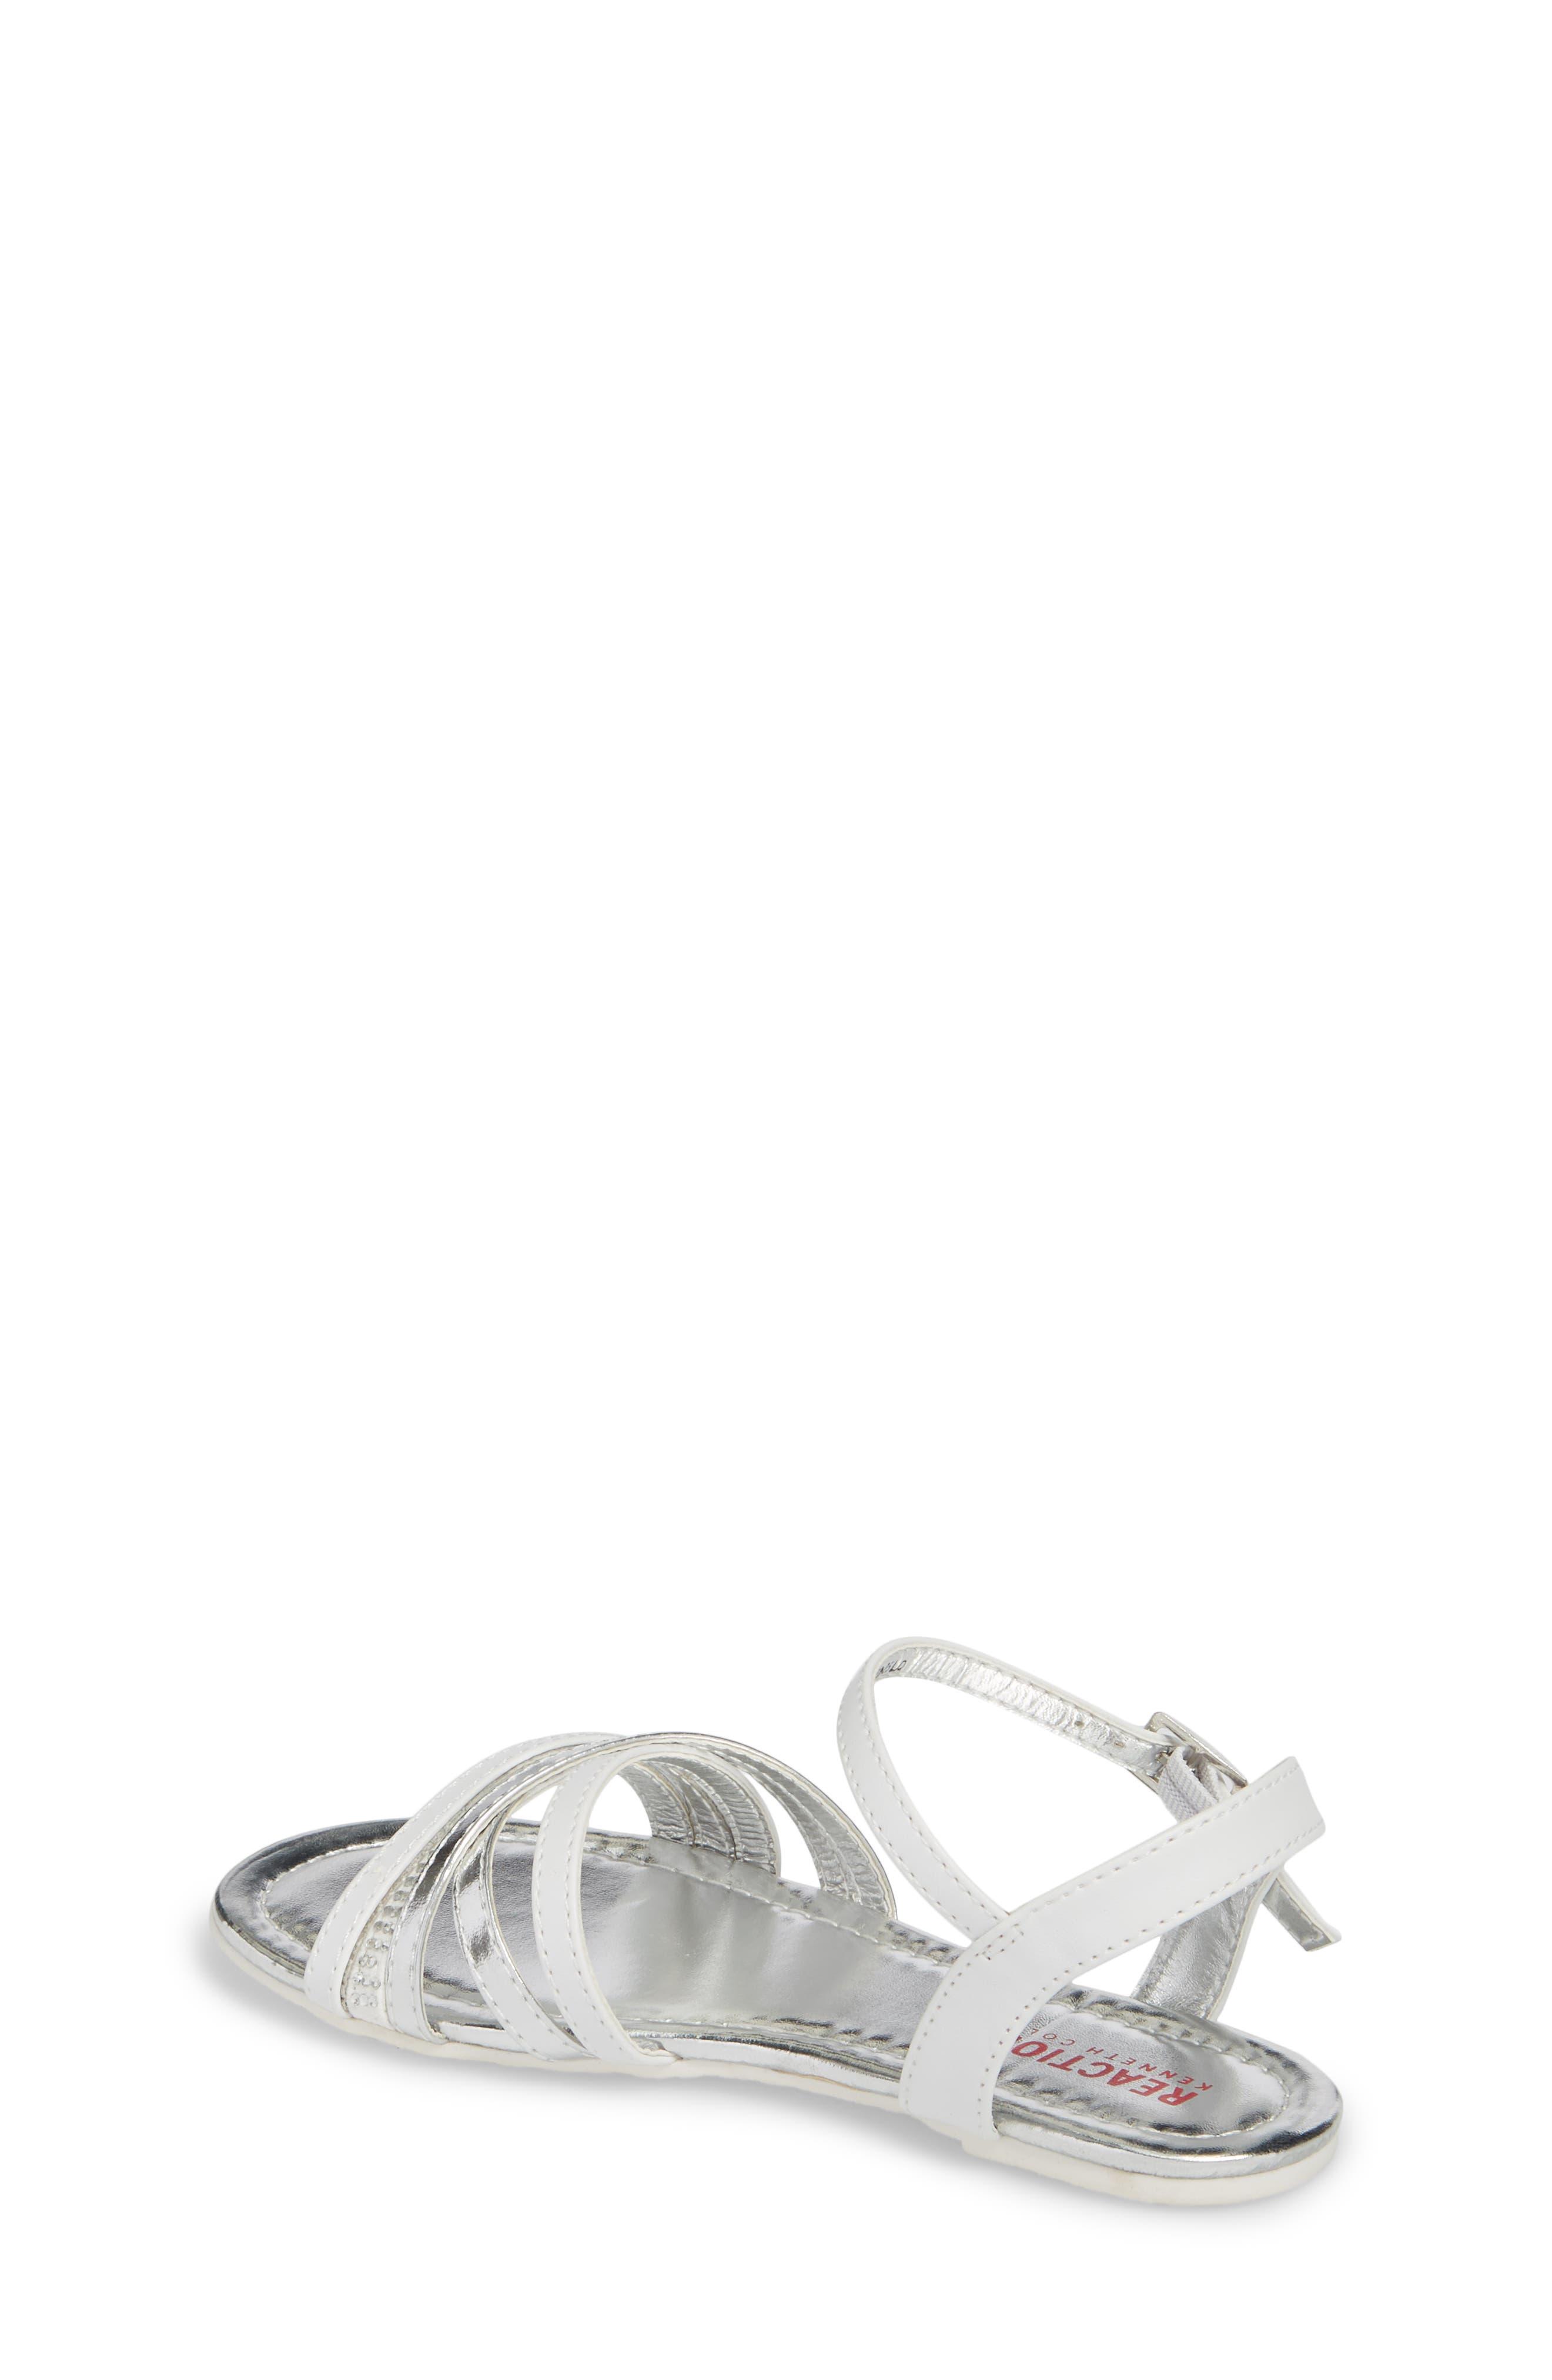 Kiera Getty Crystal Sandal,                             Alternate thumbnail 2, color,                             100